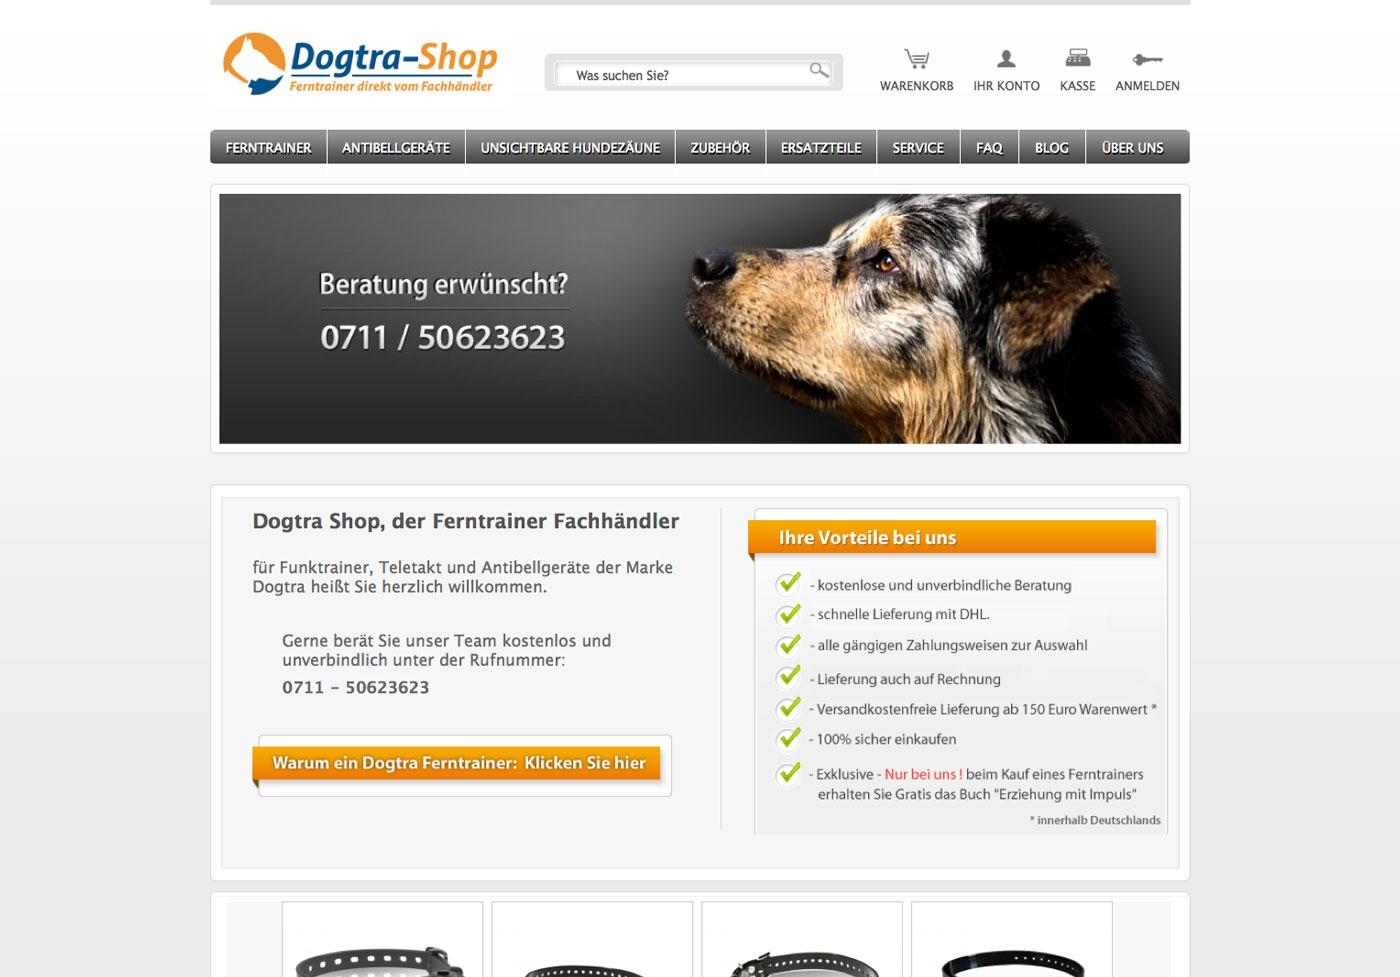 Dogtra-Shop